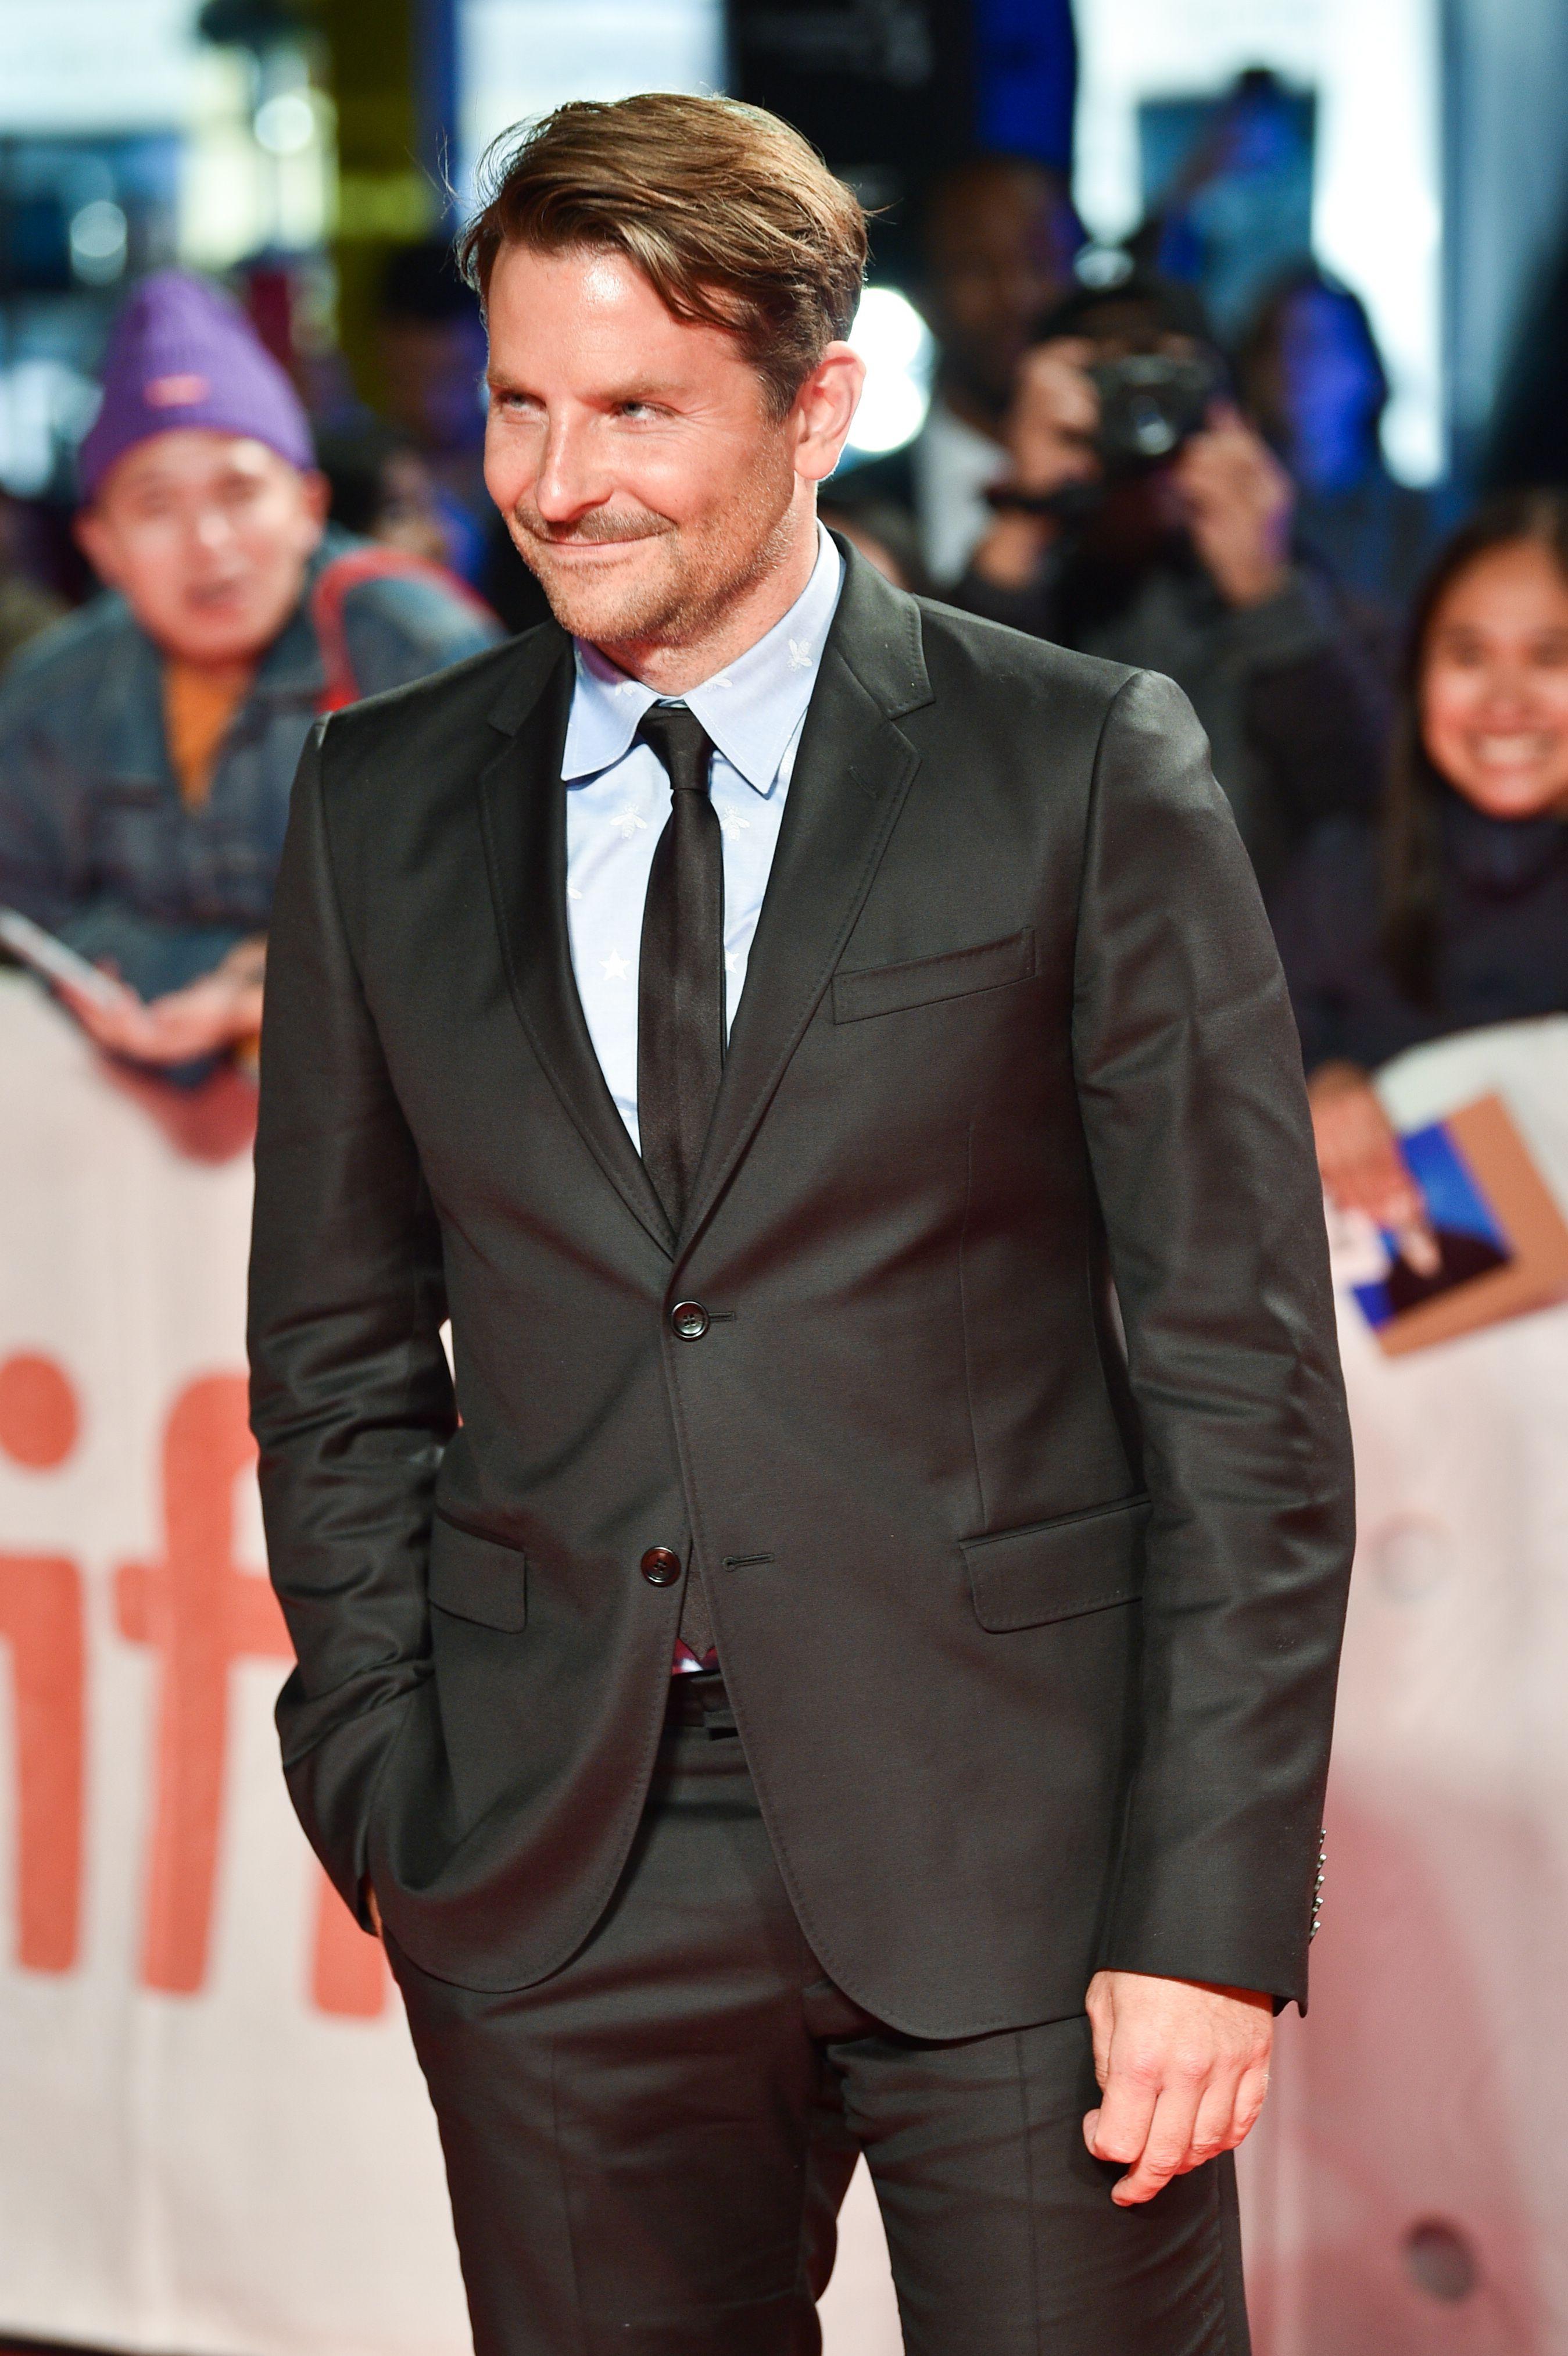 Bradley Cooper Is 'Slowly' Getting Back Onto the Dating Scene Following Irina Shayk Split